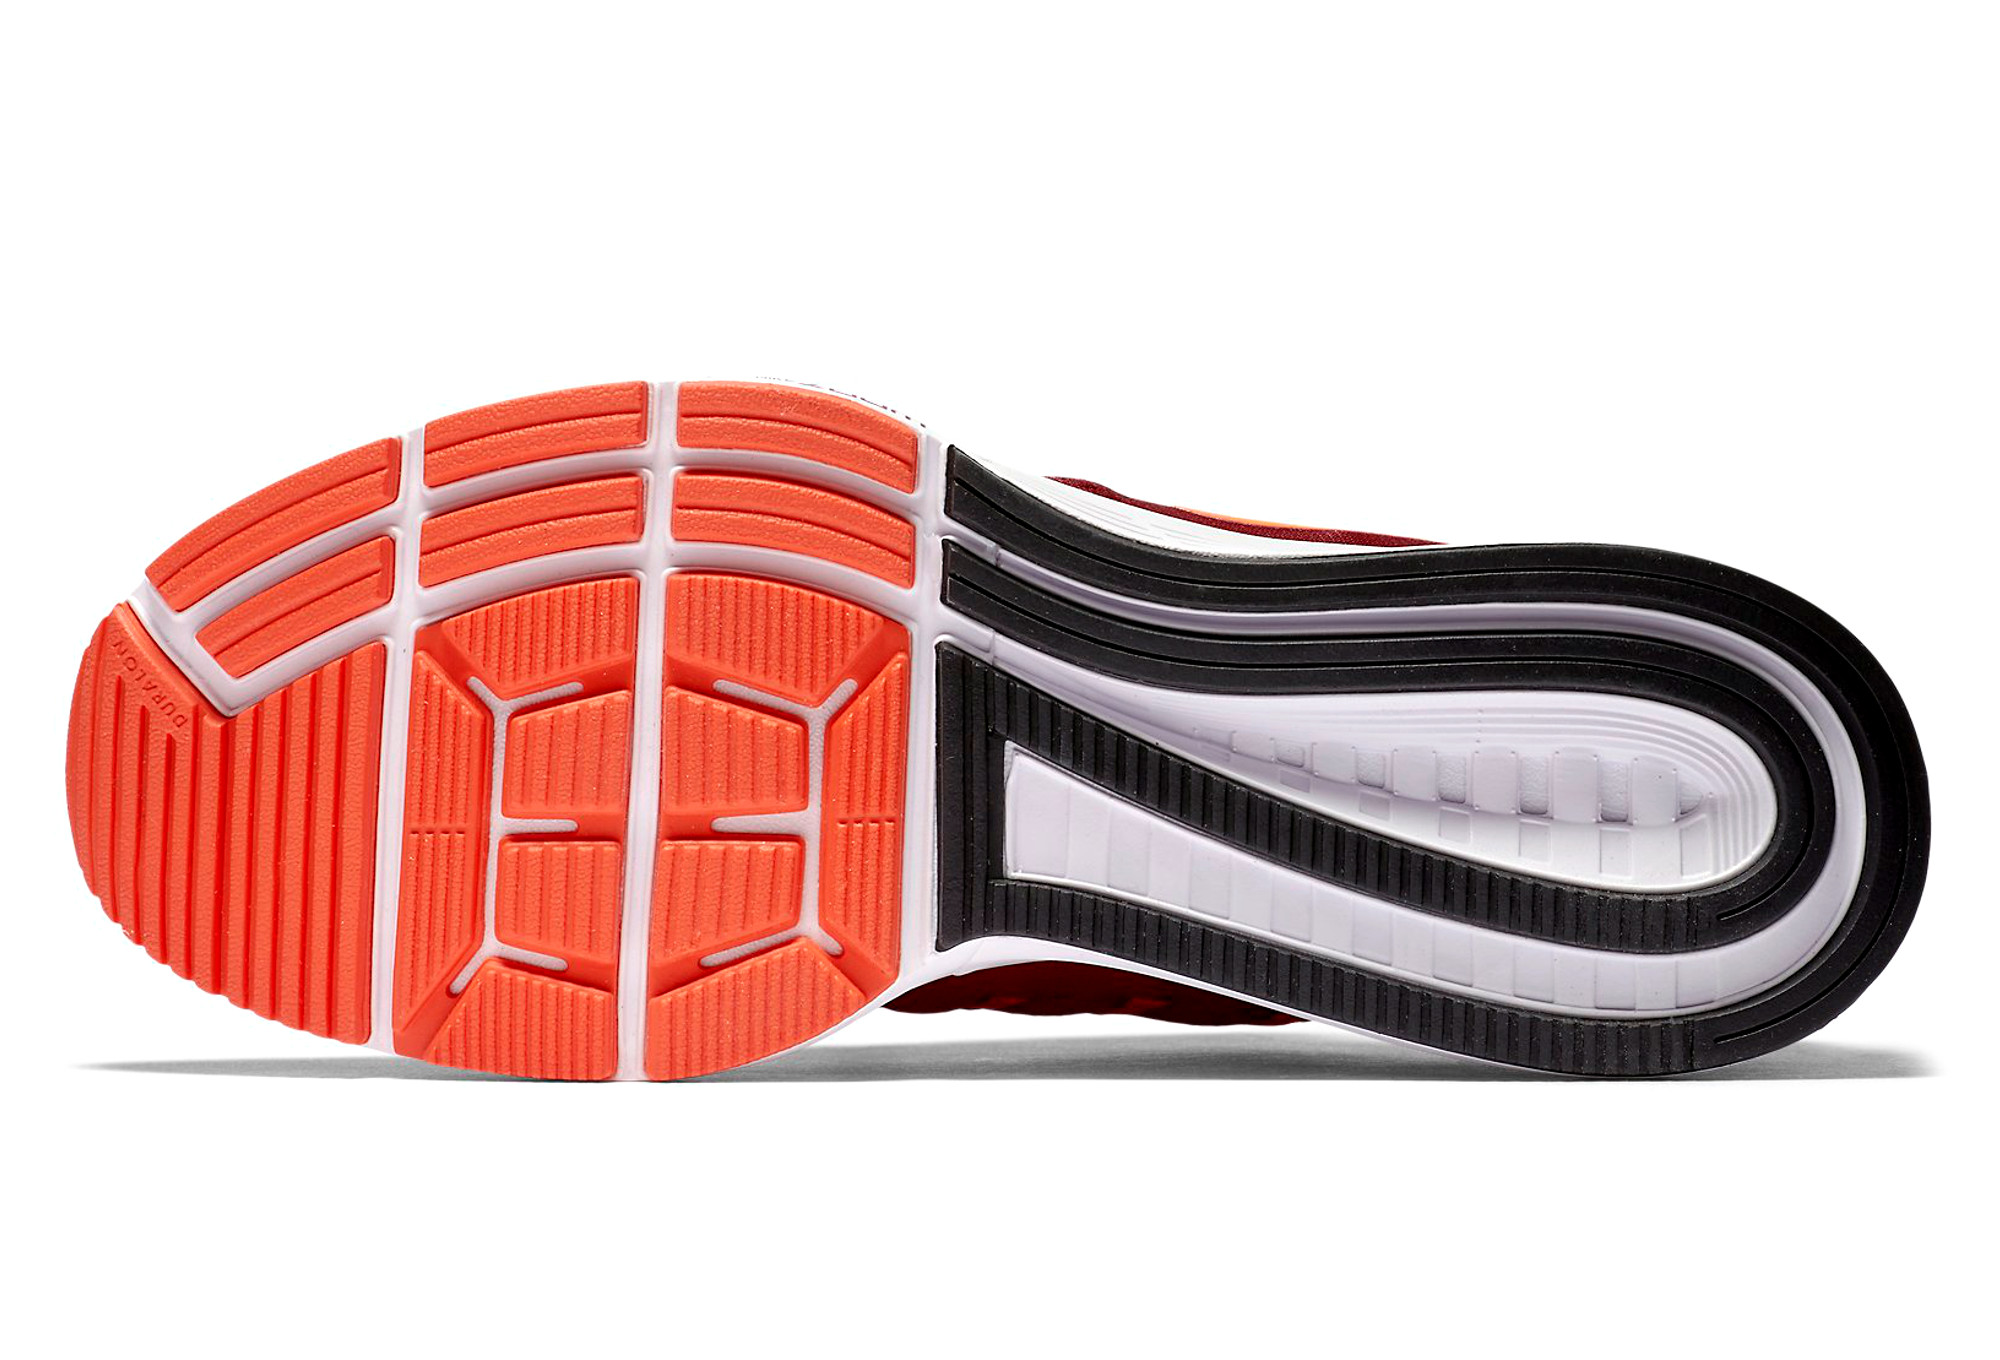 Vomero Rouge 11 Air Nike Zoom OknwN0P8X